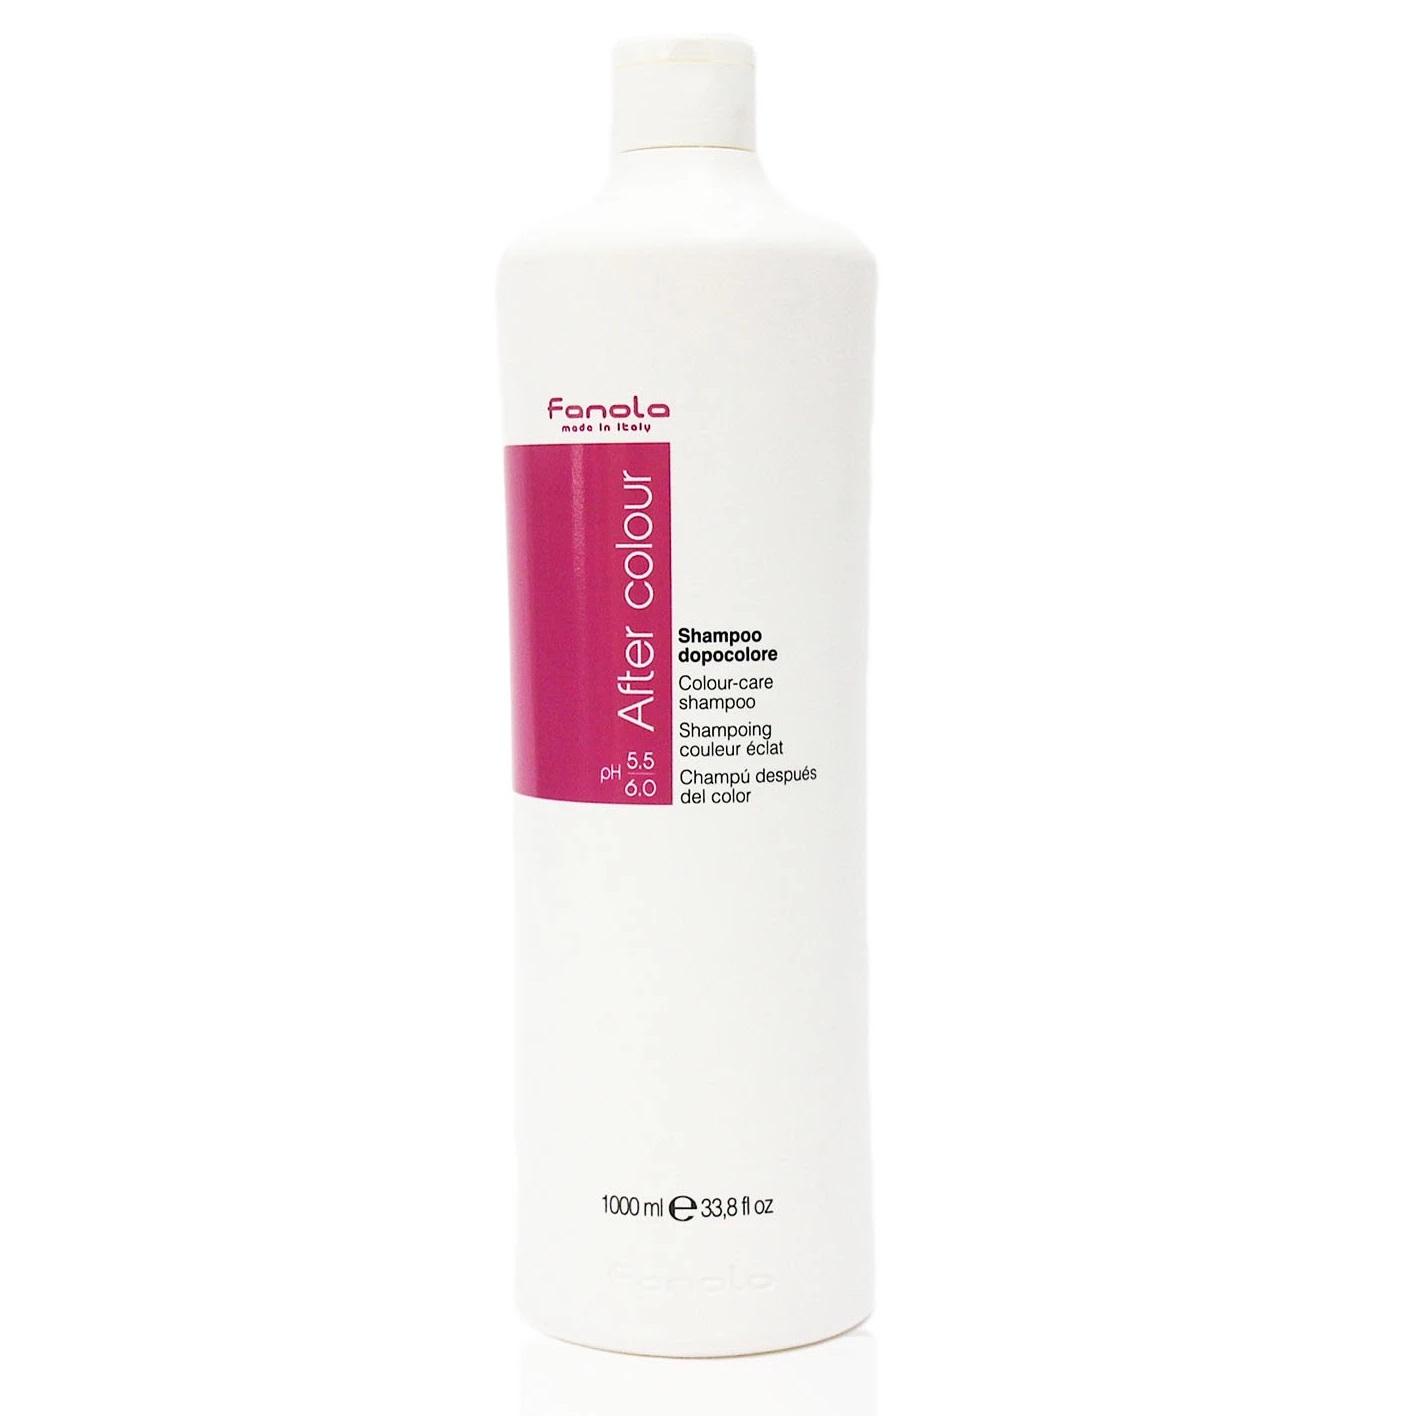 Dầu gội Fanola After Colour Care shampoo chăm sóc tóc nhuộm giữ màu lâu phai Italy 1000ml